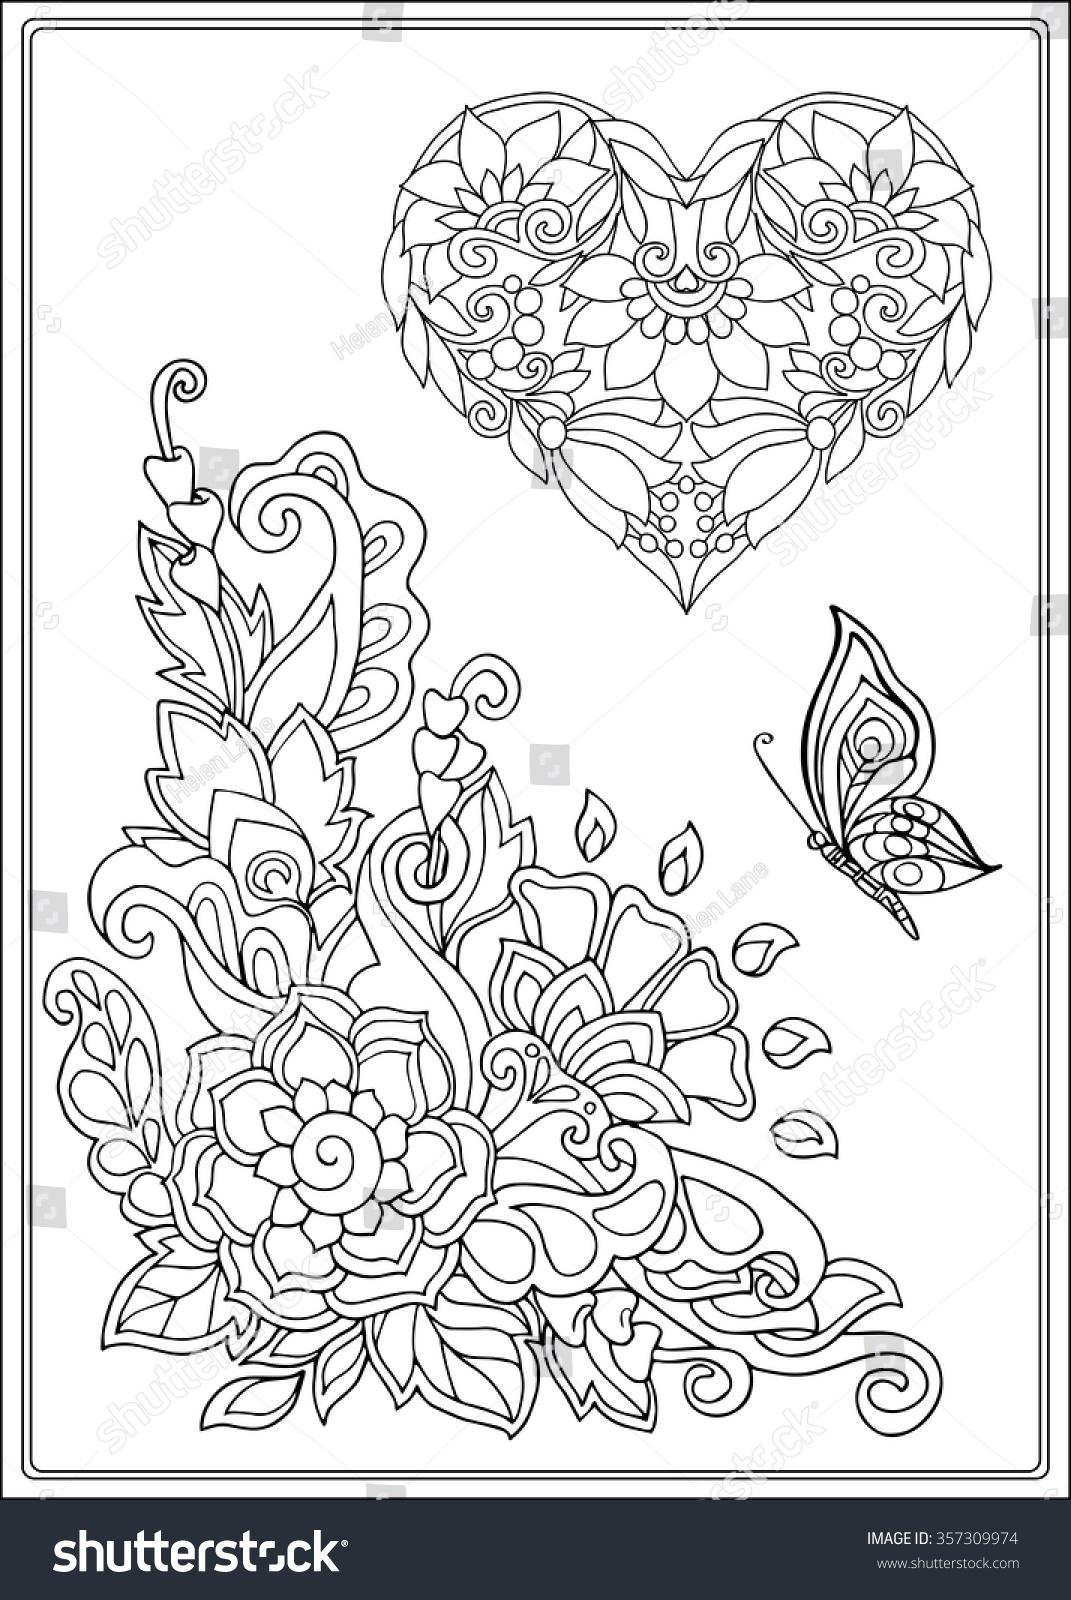 Decorative Love Heart Flowers Butterflies Valentines Stock Vector ...